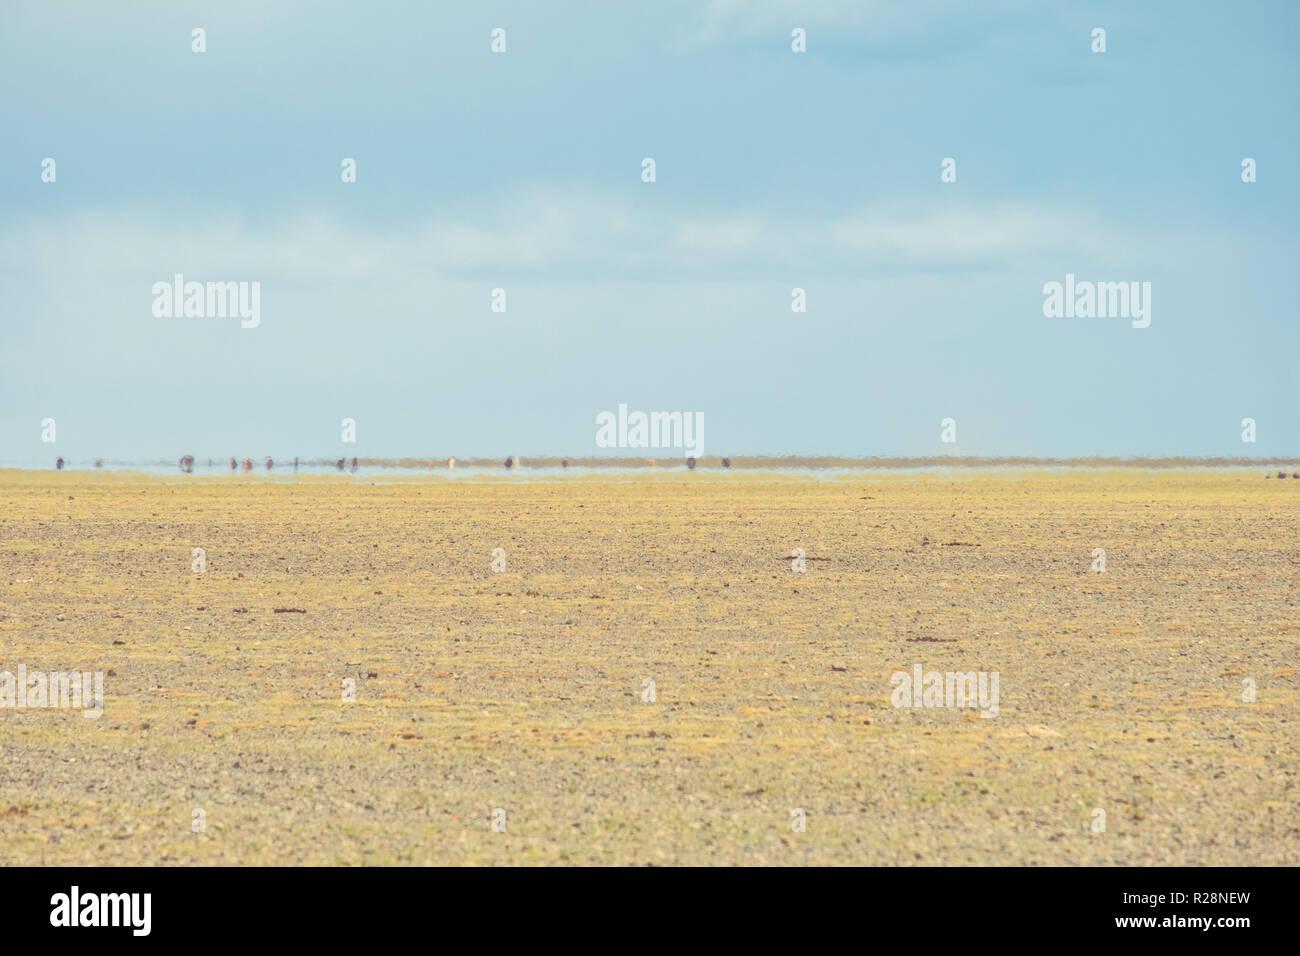 An inferior mirage on the Gobi desert in Mongolia. - Stock Image